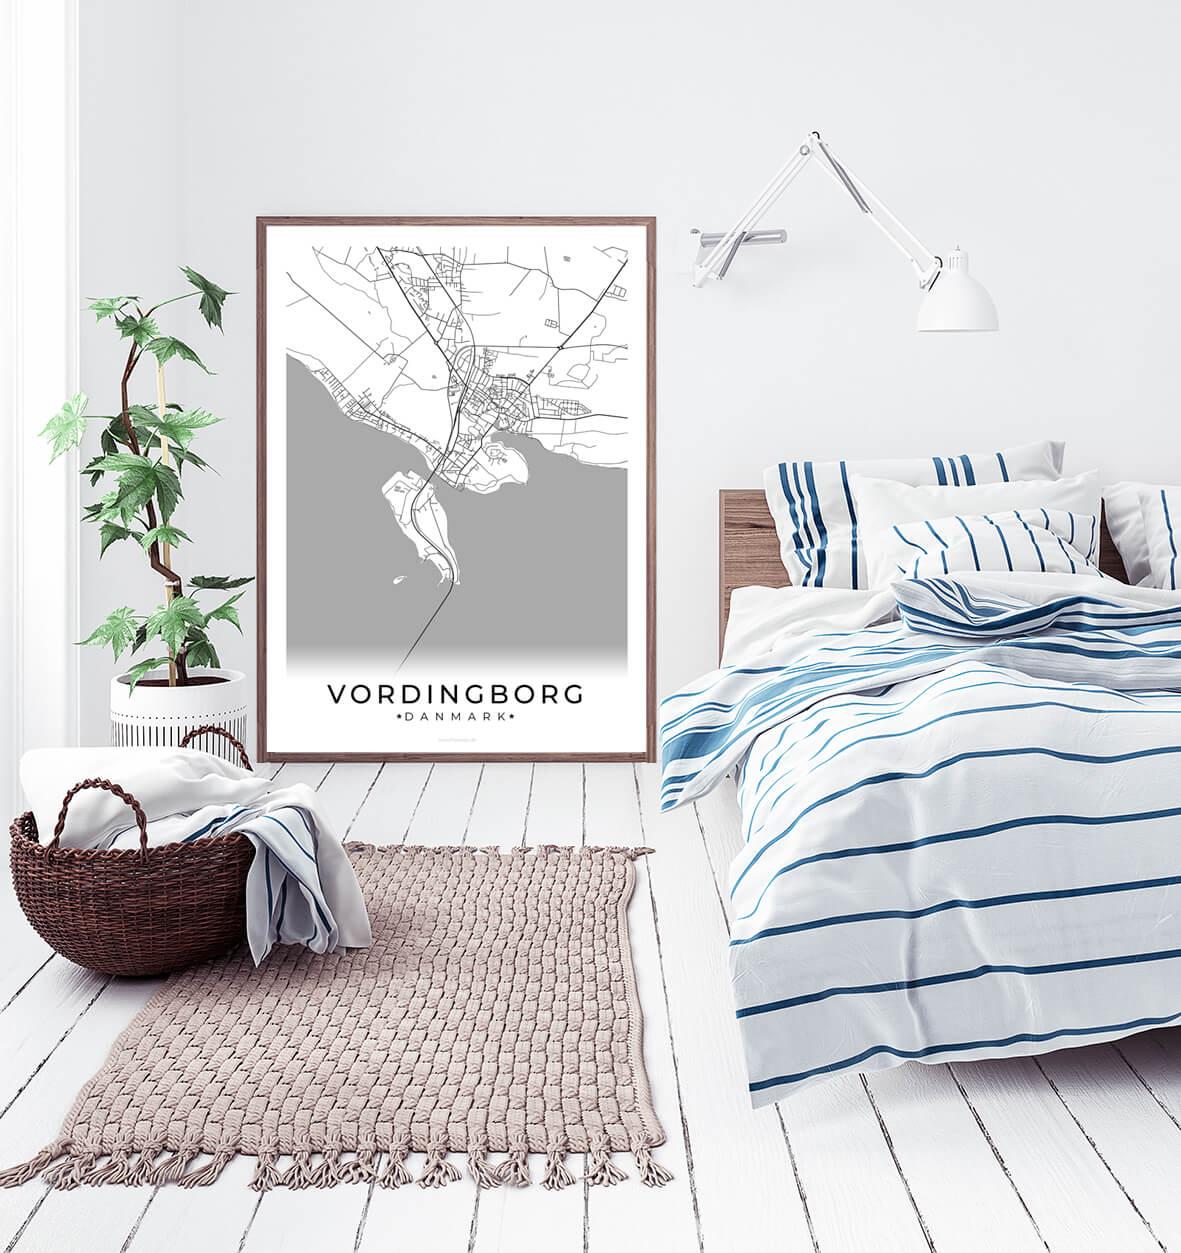 Vordingborg-hvid-byplakat-2